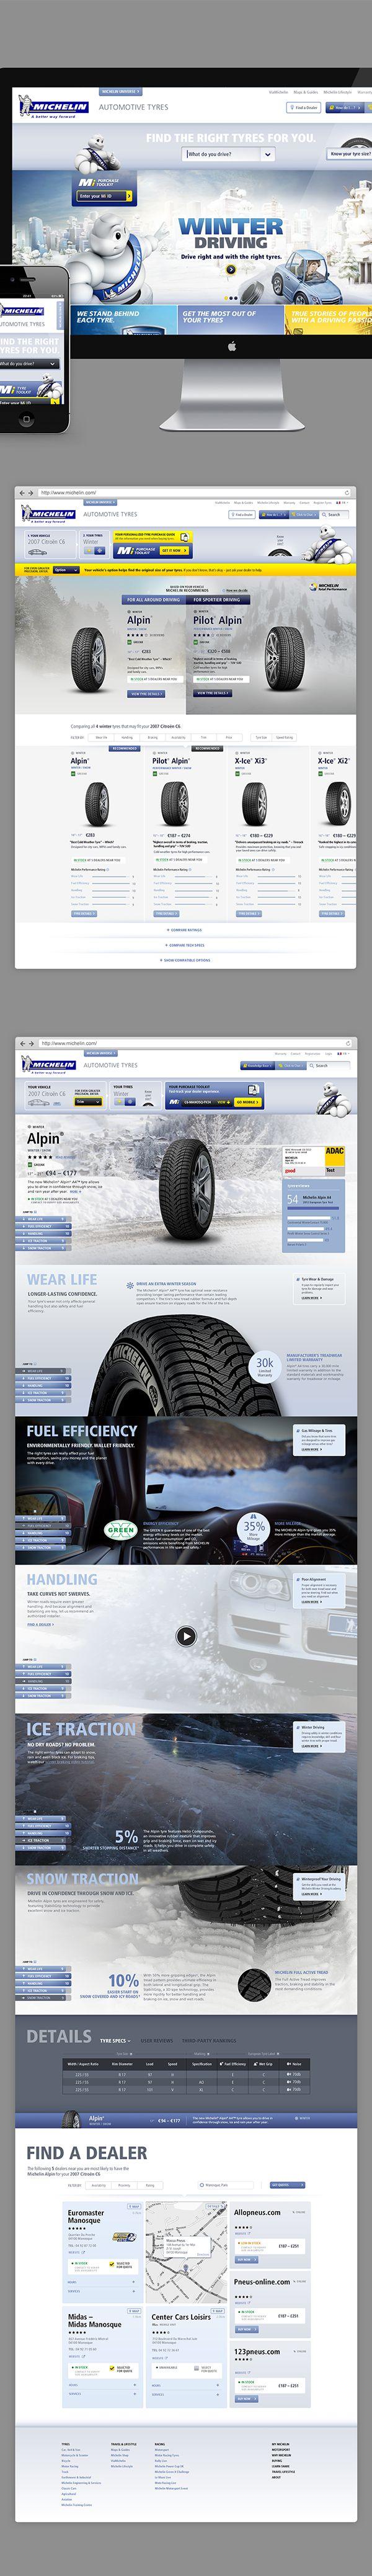 pinterest.com/fra411 #webdesign - Michelin Pitch by Annmarie Akong, via Behance